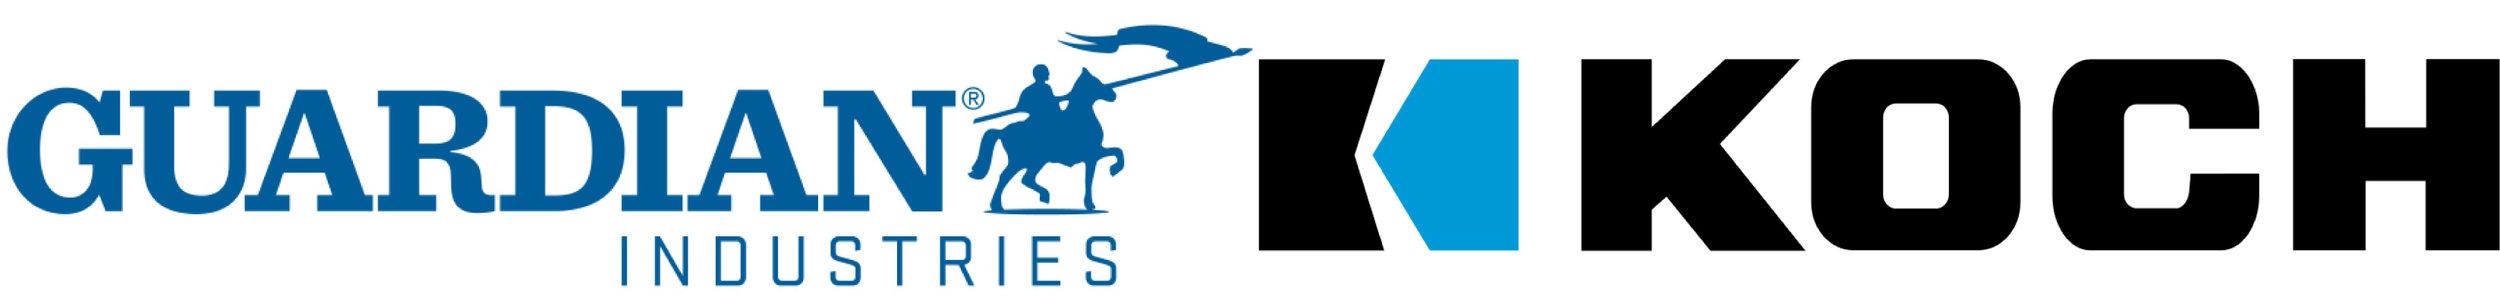 Logos Cover for Webpage.jpg